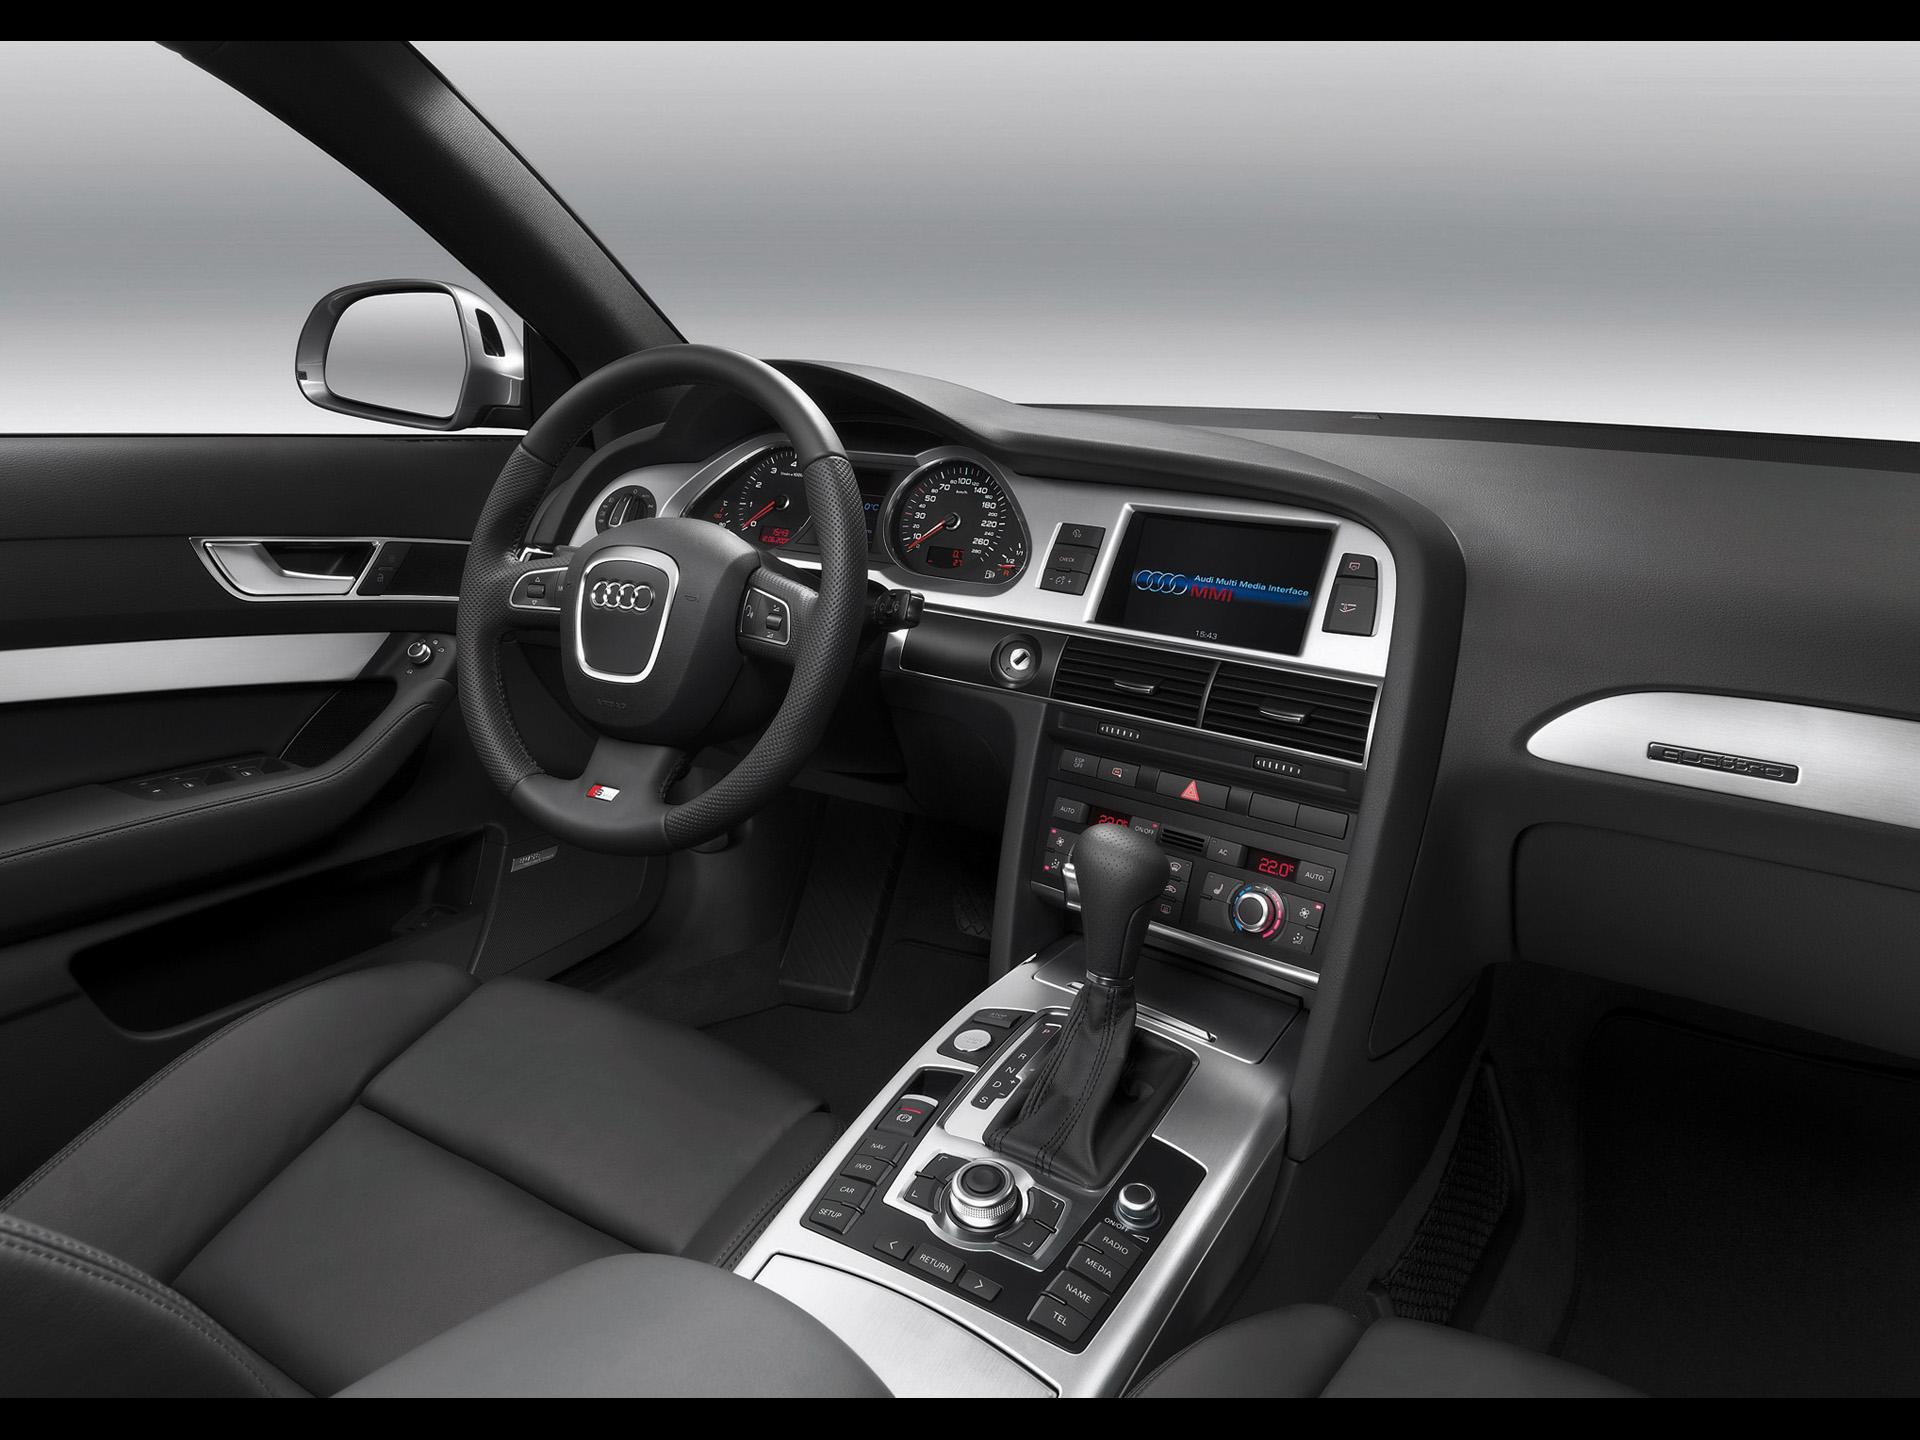 2009 Audi A6 Image 11